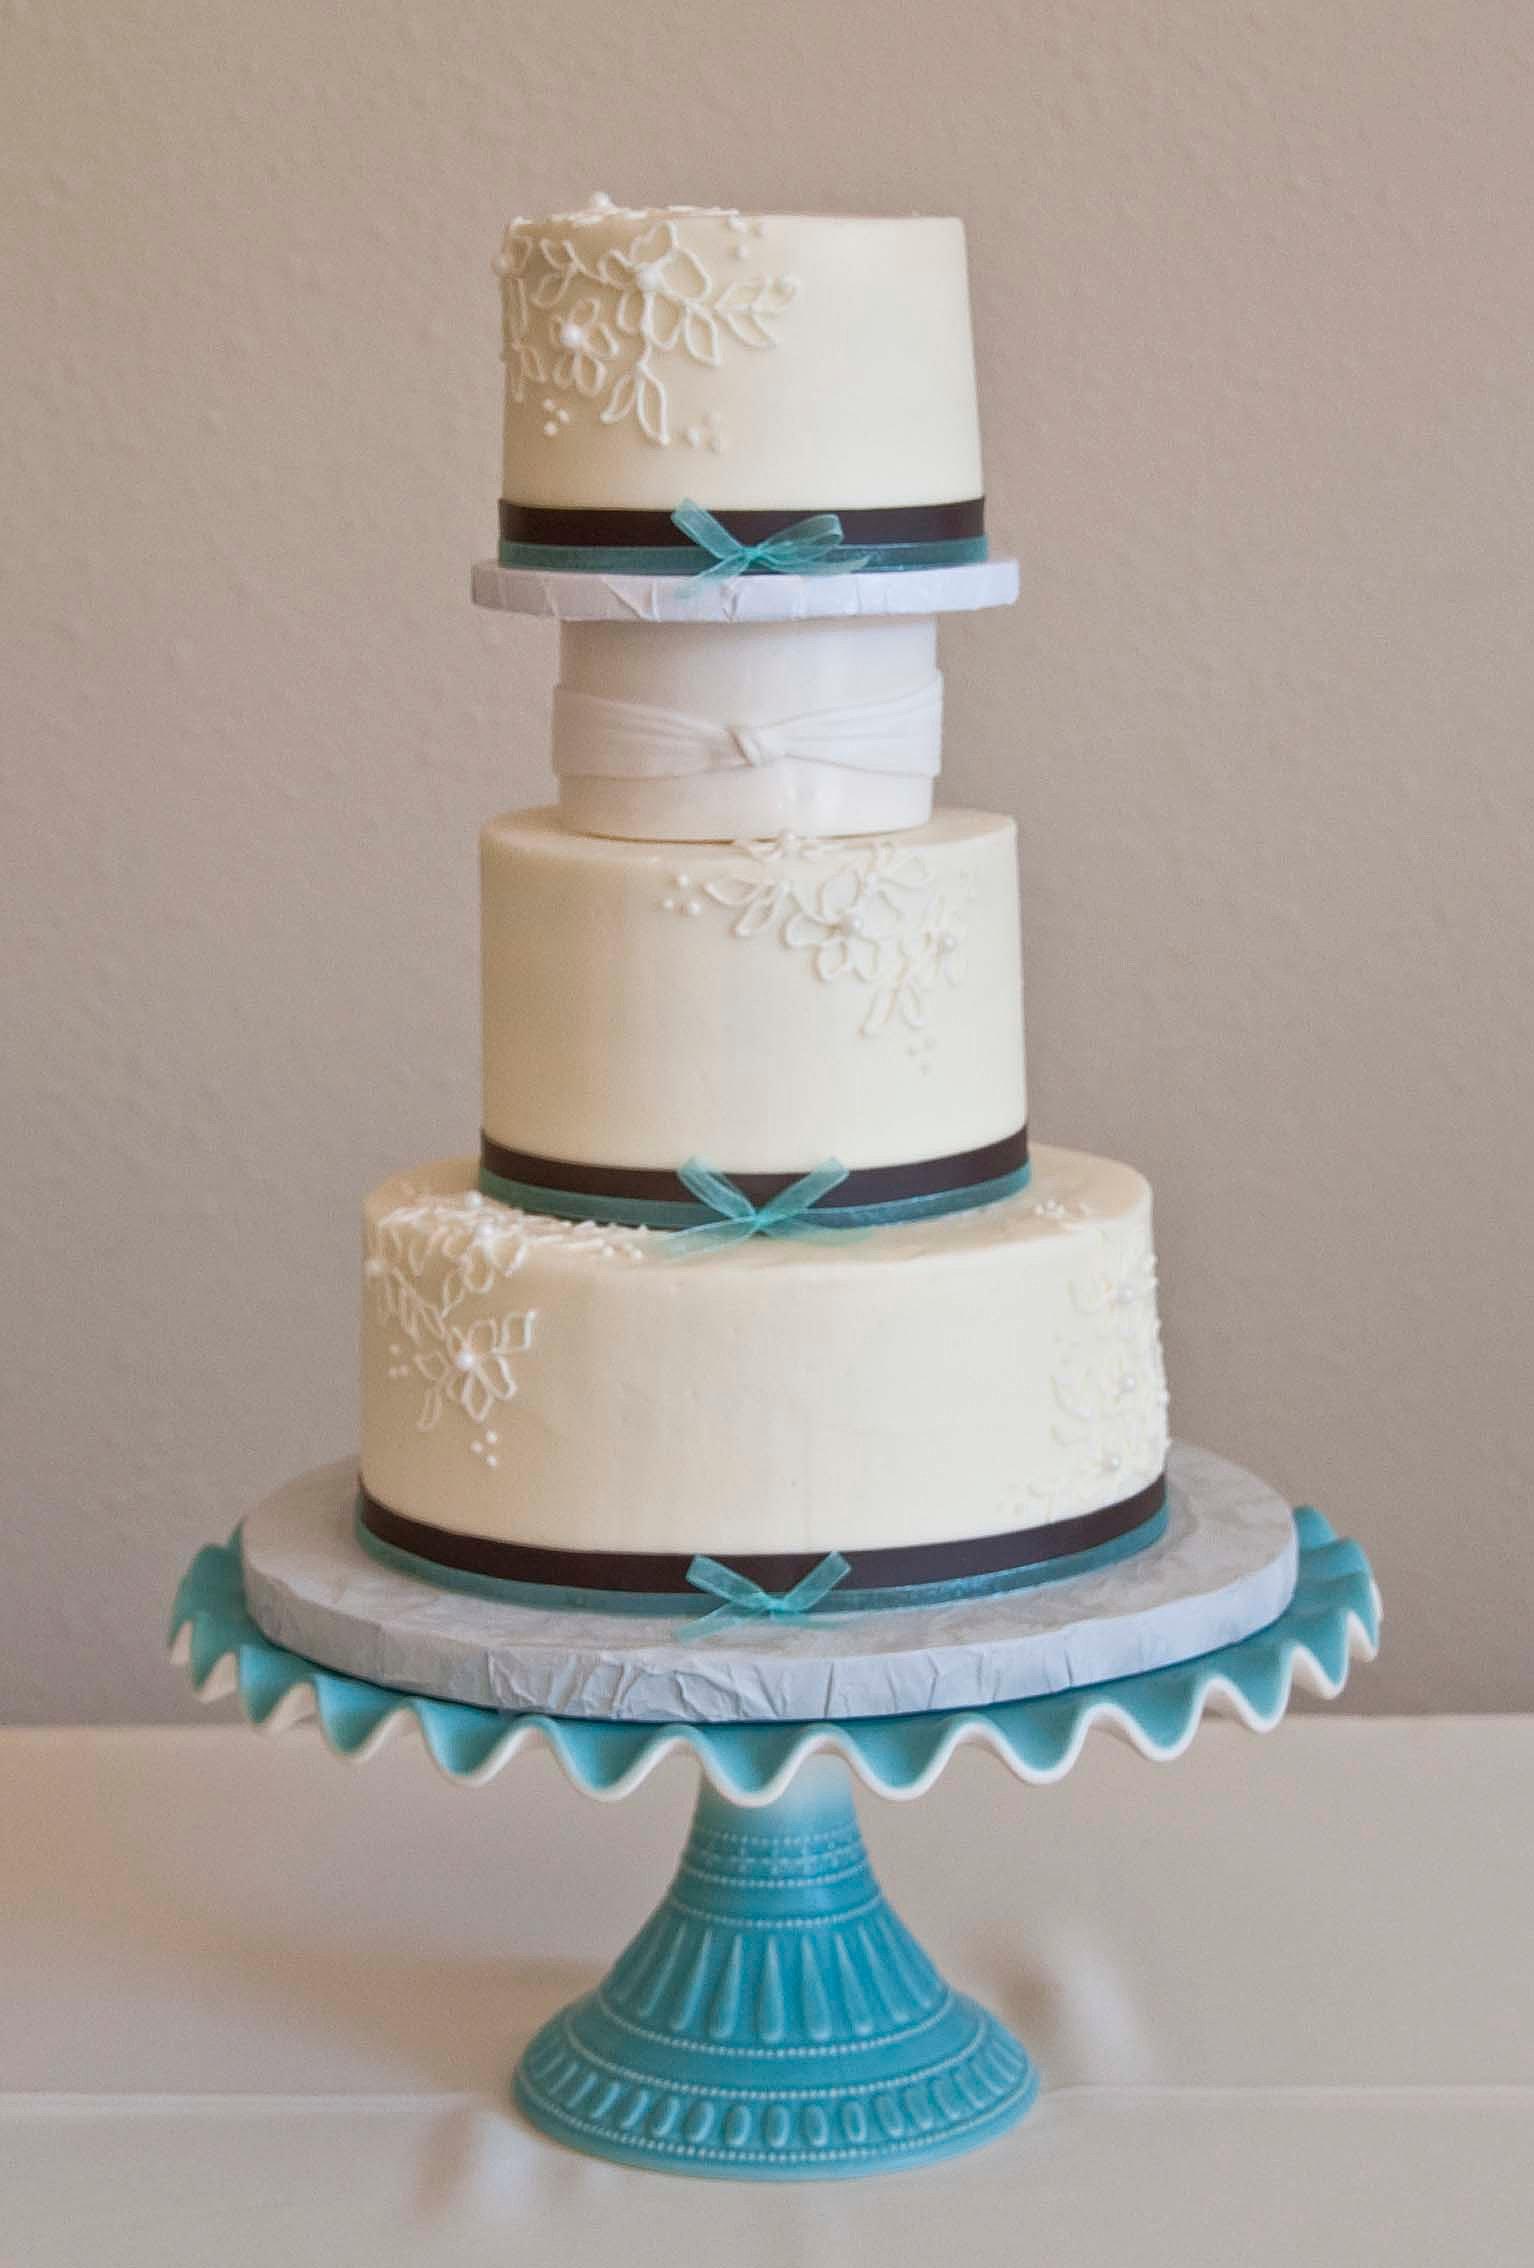 Calavera Cakery Wedding Cakes Bakery Longview Texas